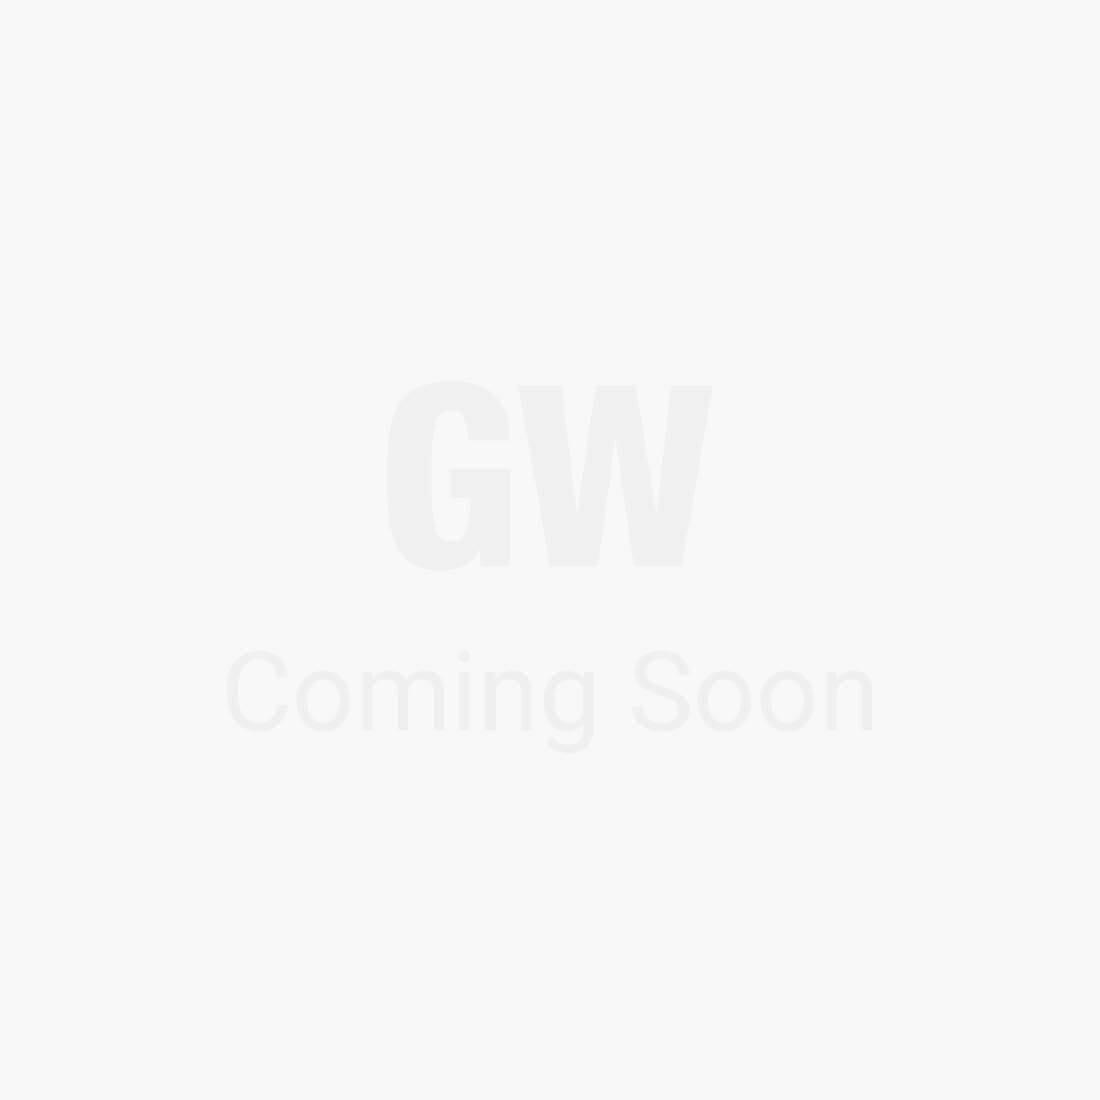 Hugo Grand 3 Seater Sofa